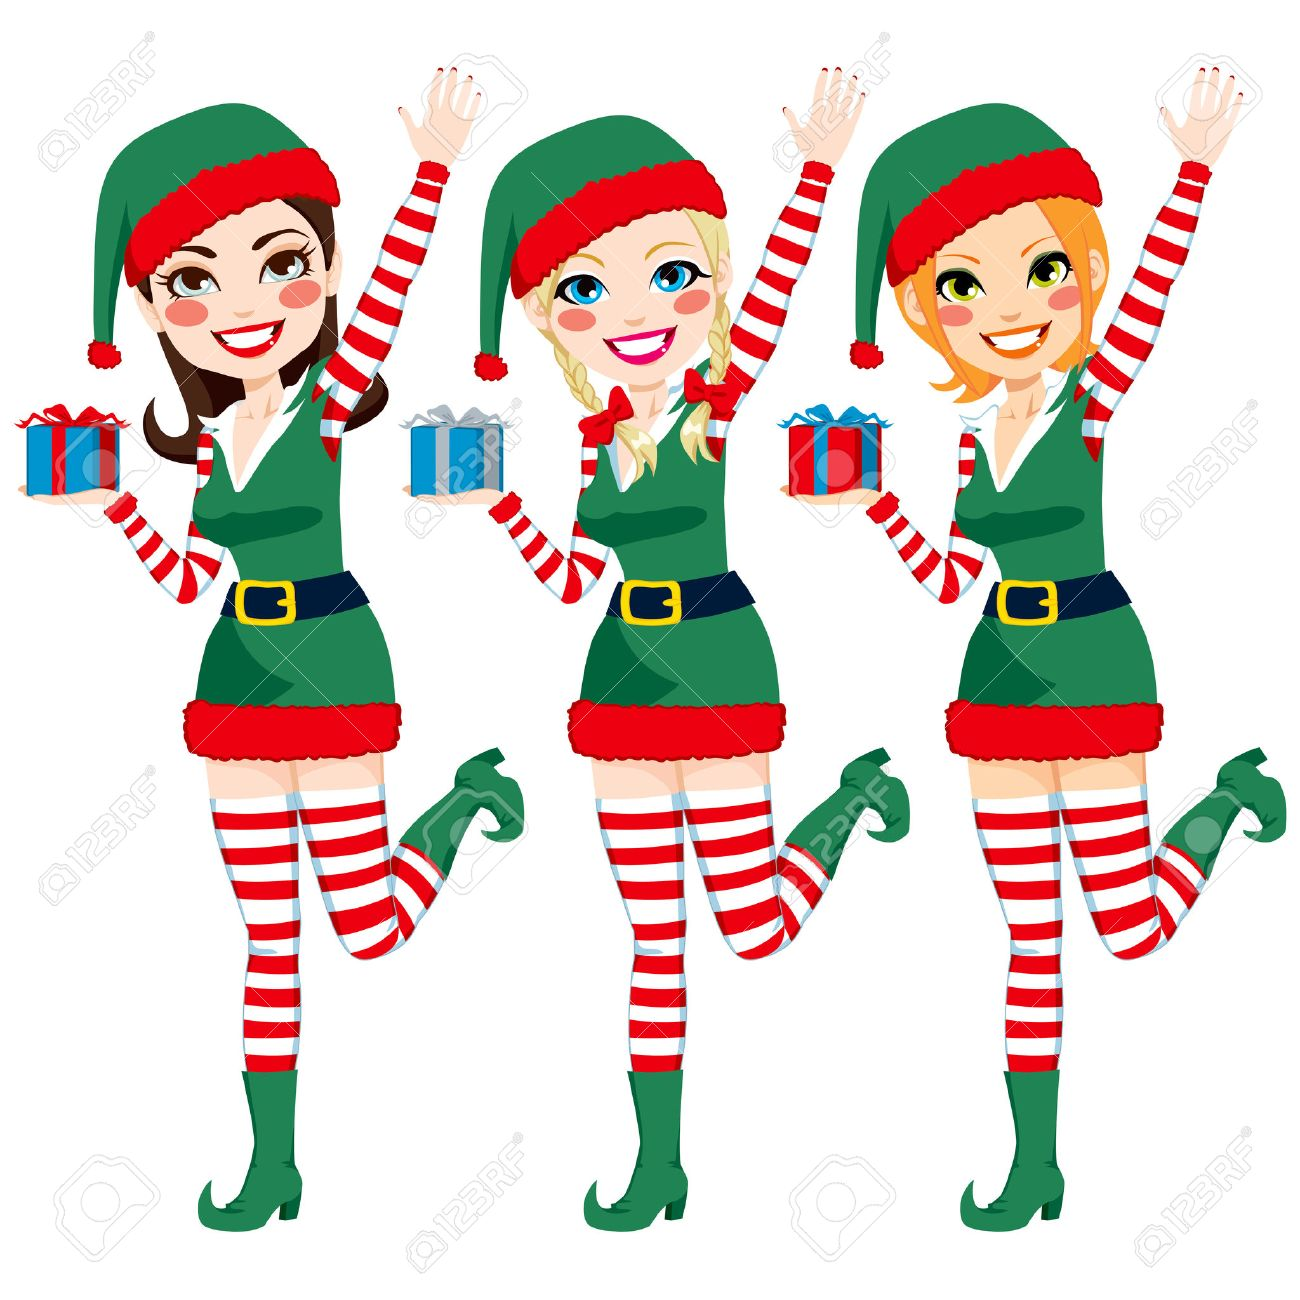 Three beautiful Santa Claus Elf helpers holding Christmas presents and waving hand Stock Vector - 22964399